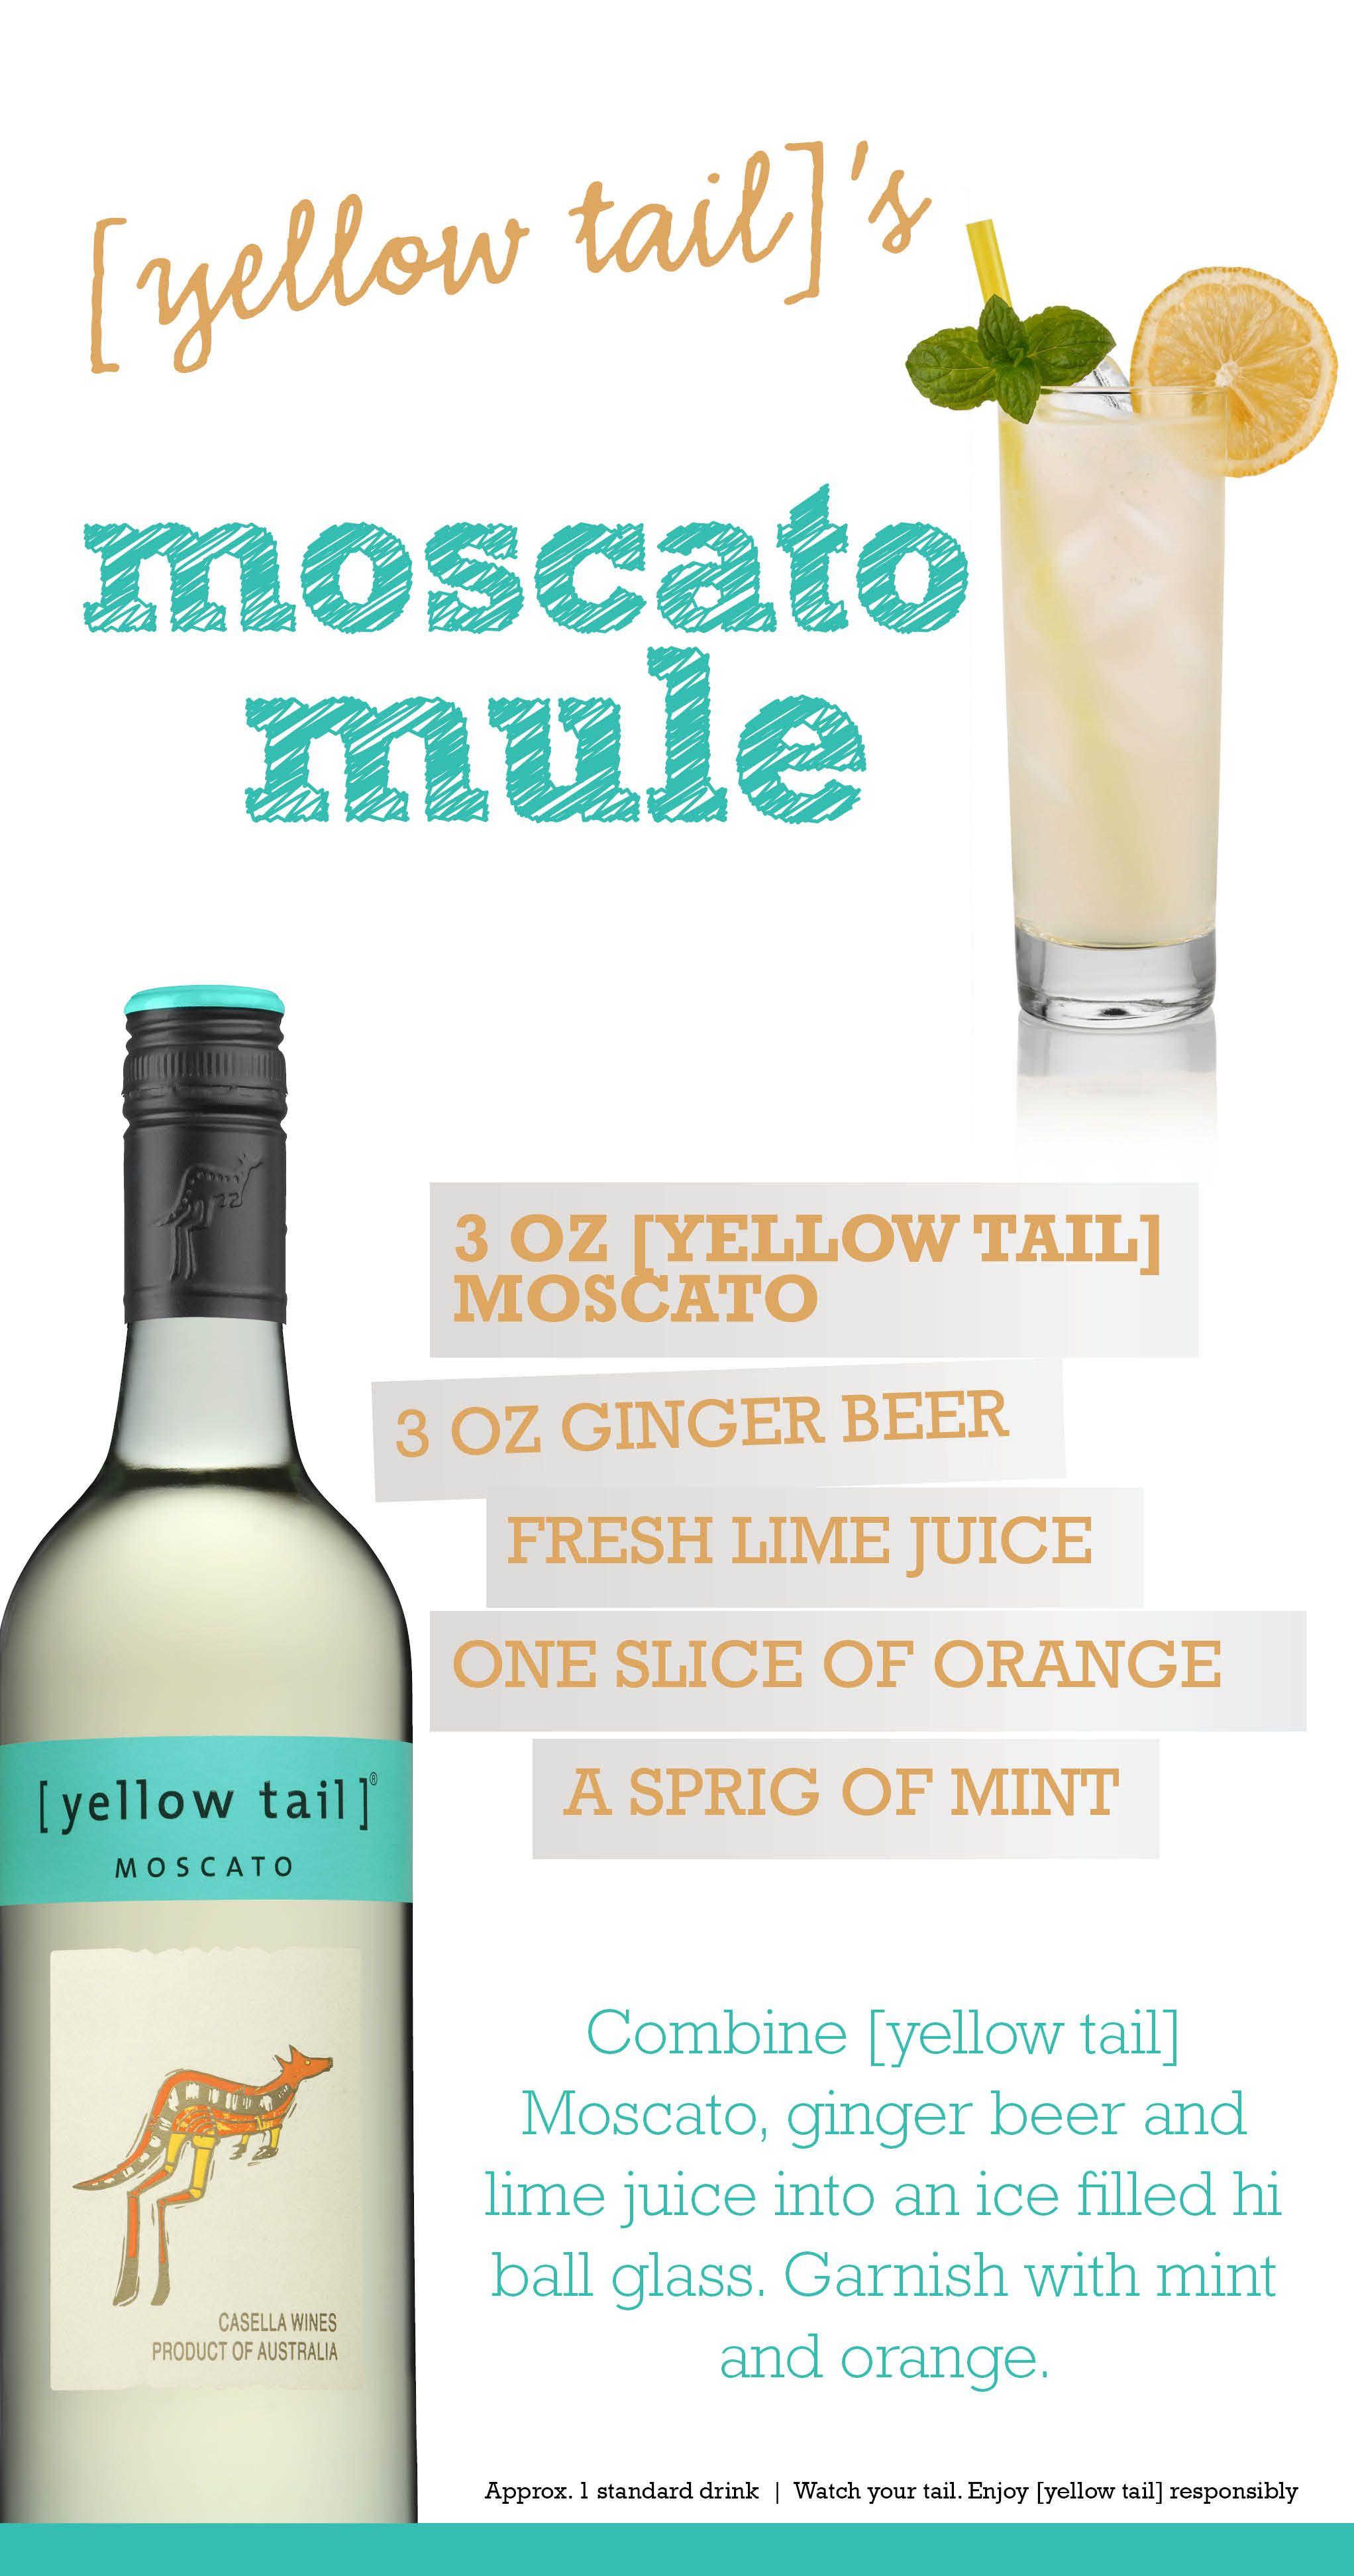 Yellow Tail Moo Mule Wine